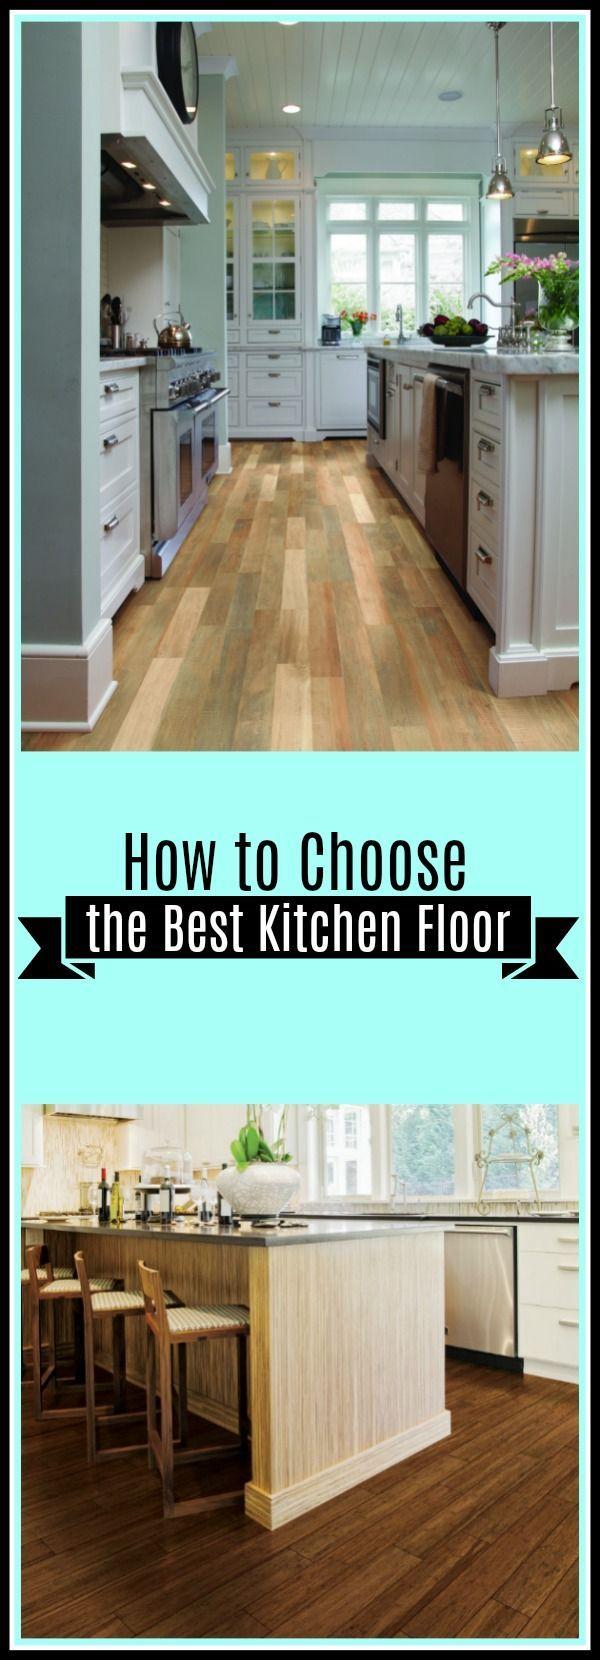 how-to-choose-the-best-kitchen-floor-incstores